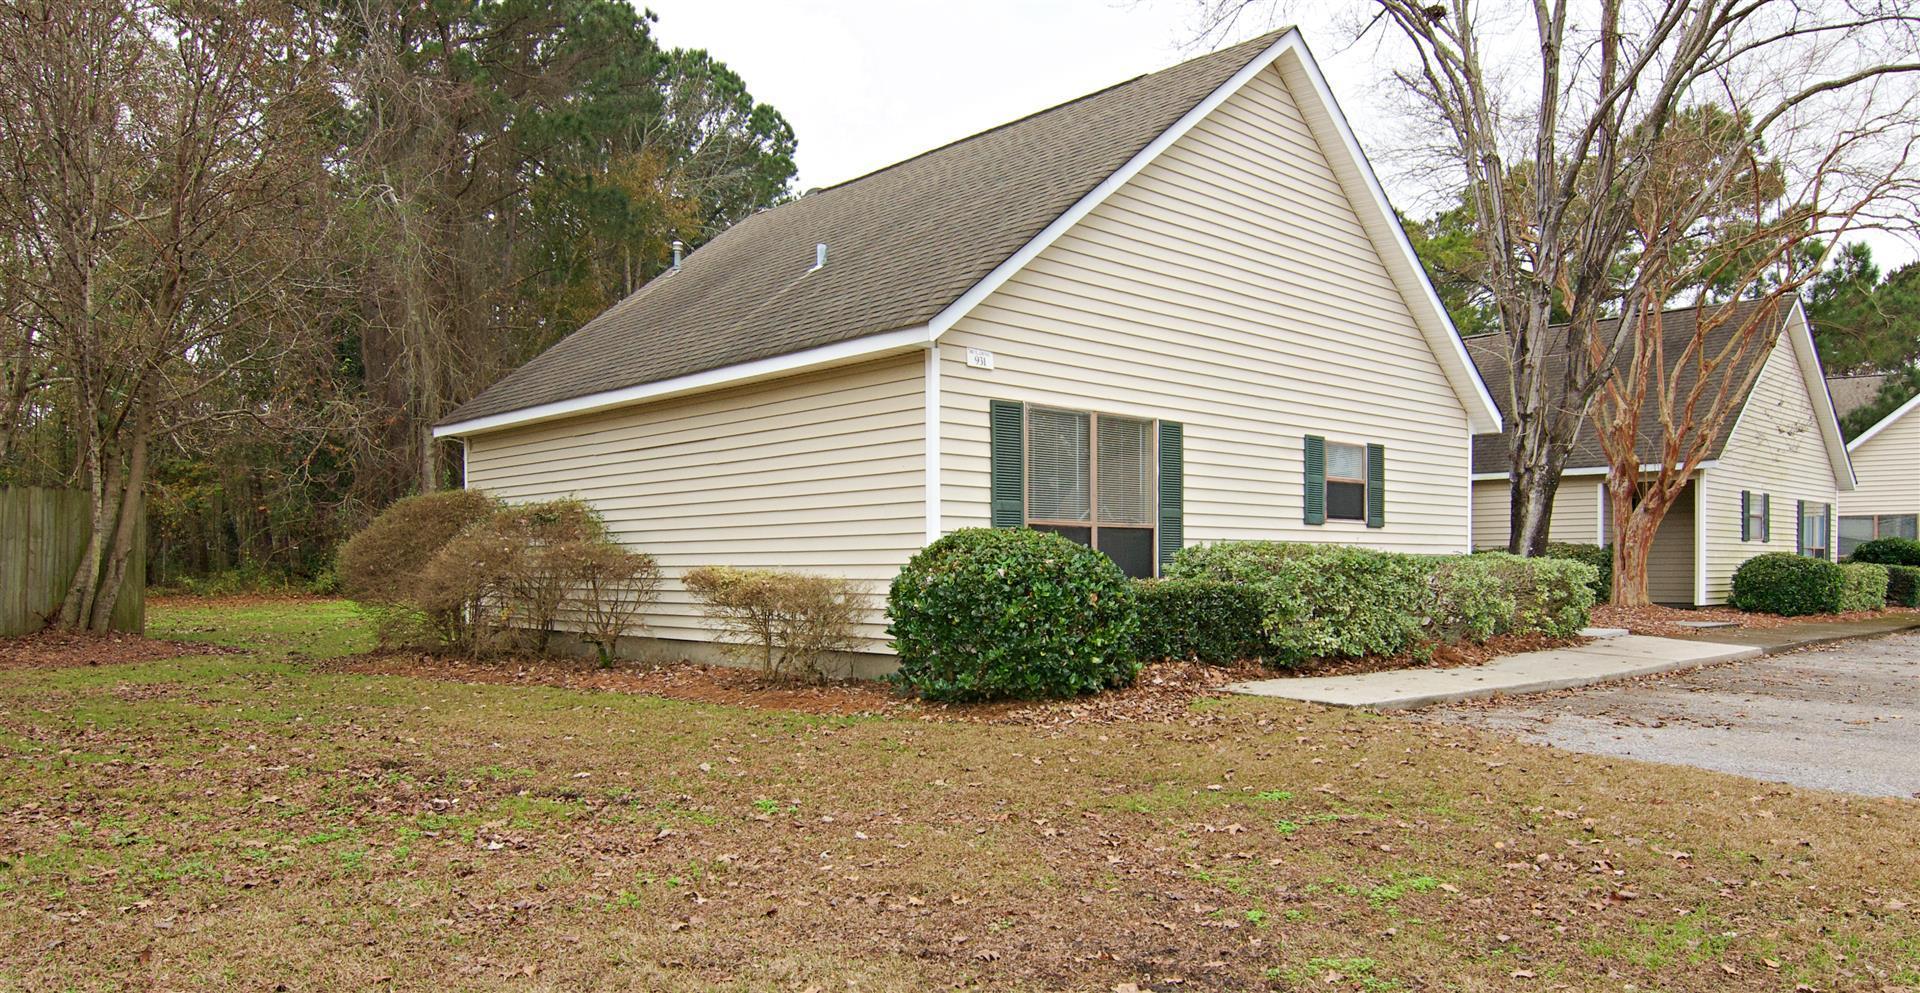 Shaftesbury Woods Homes For Sale - 931 Estates, Charleston, SC - 15